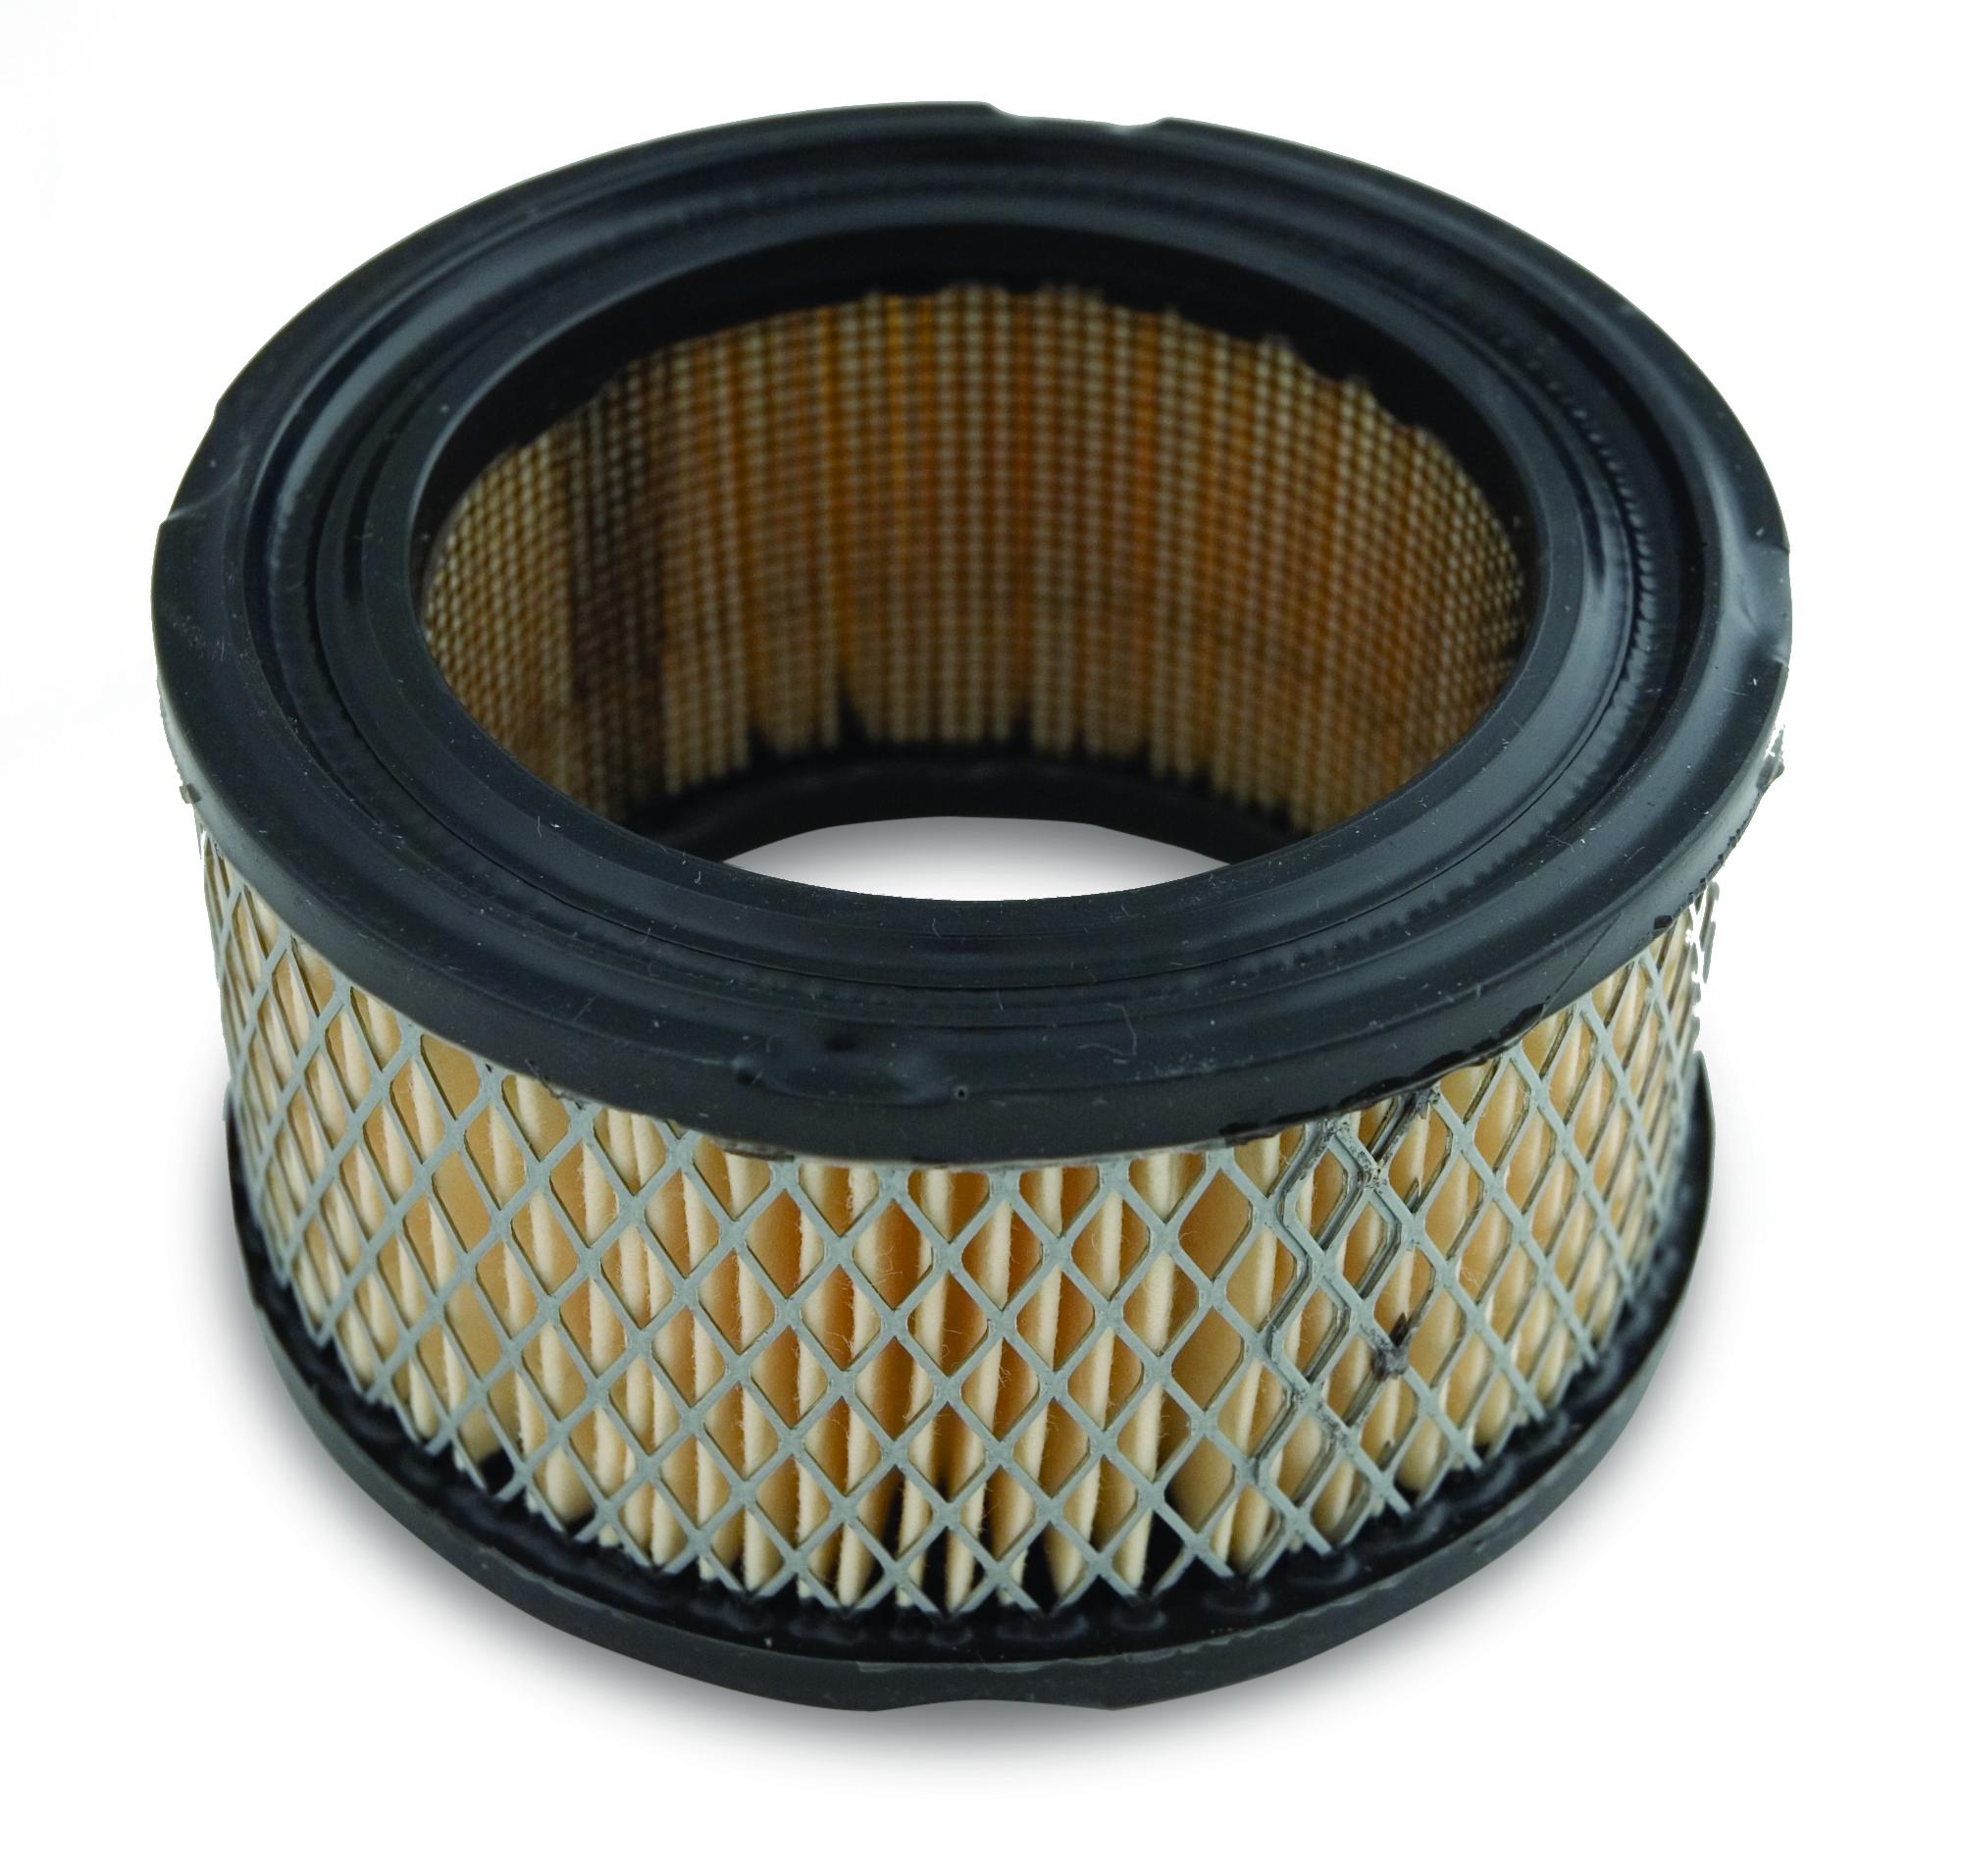 Air Filter Shop Pack For Kohler # 25-883-01-S 2588301S